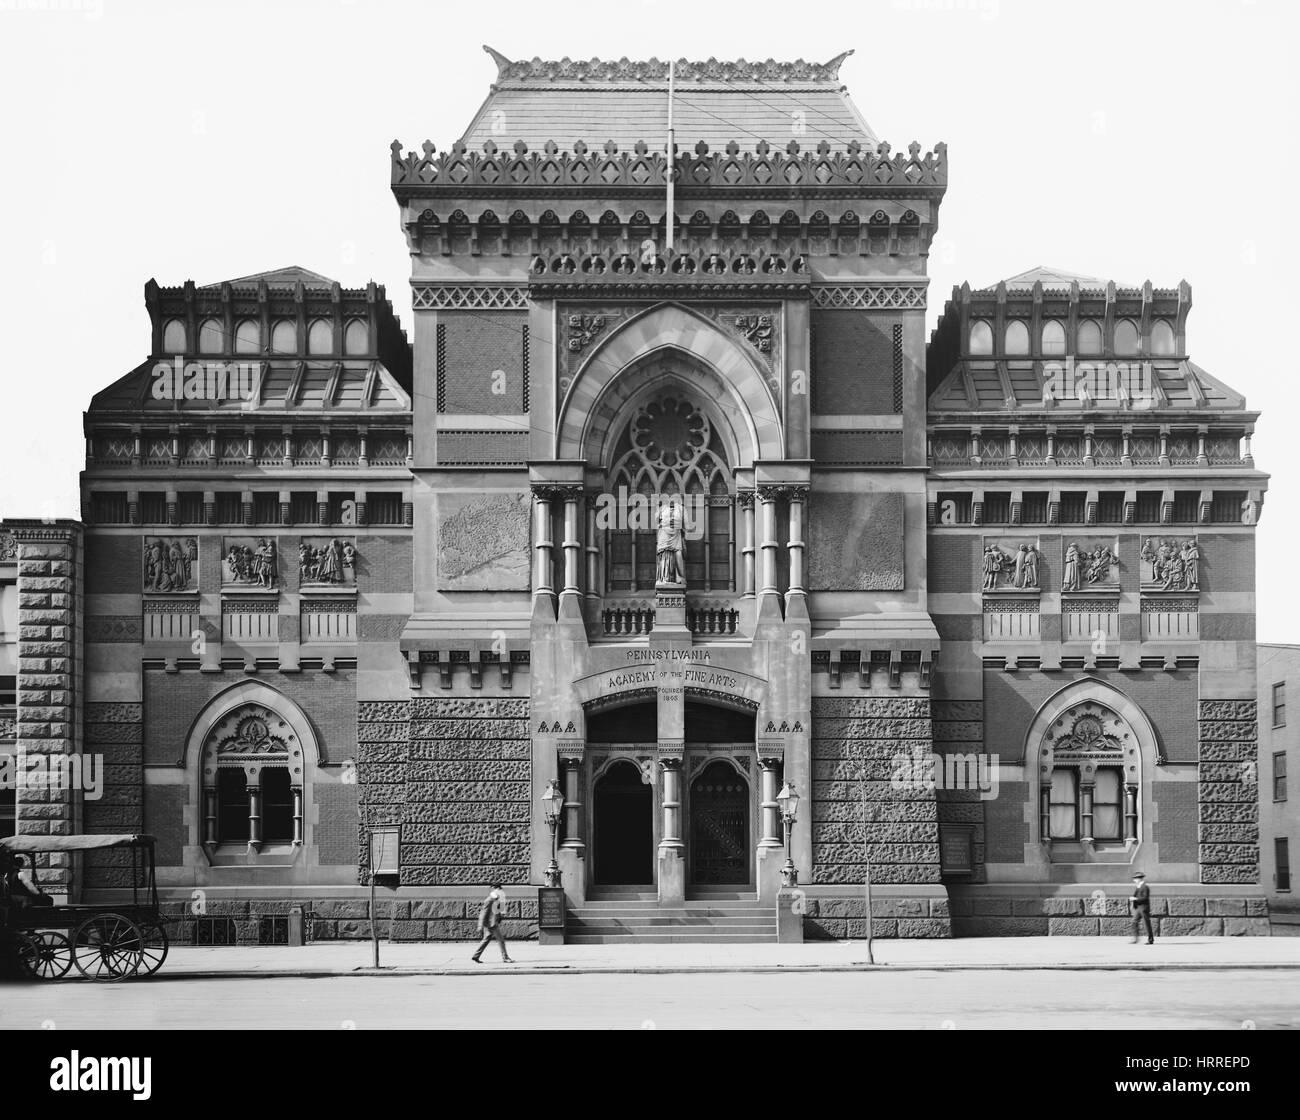 Pennsylvania Academy of Fine Arts, Philadelphia, Pennsylvania, USA, Detroit Publishing Company, 1905 - Stock Image